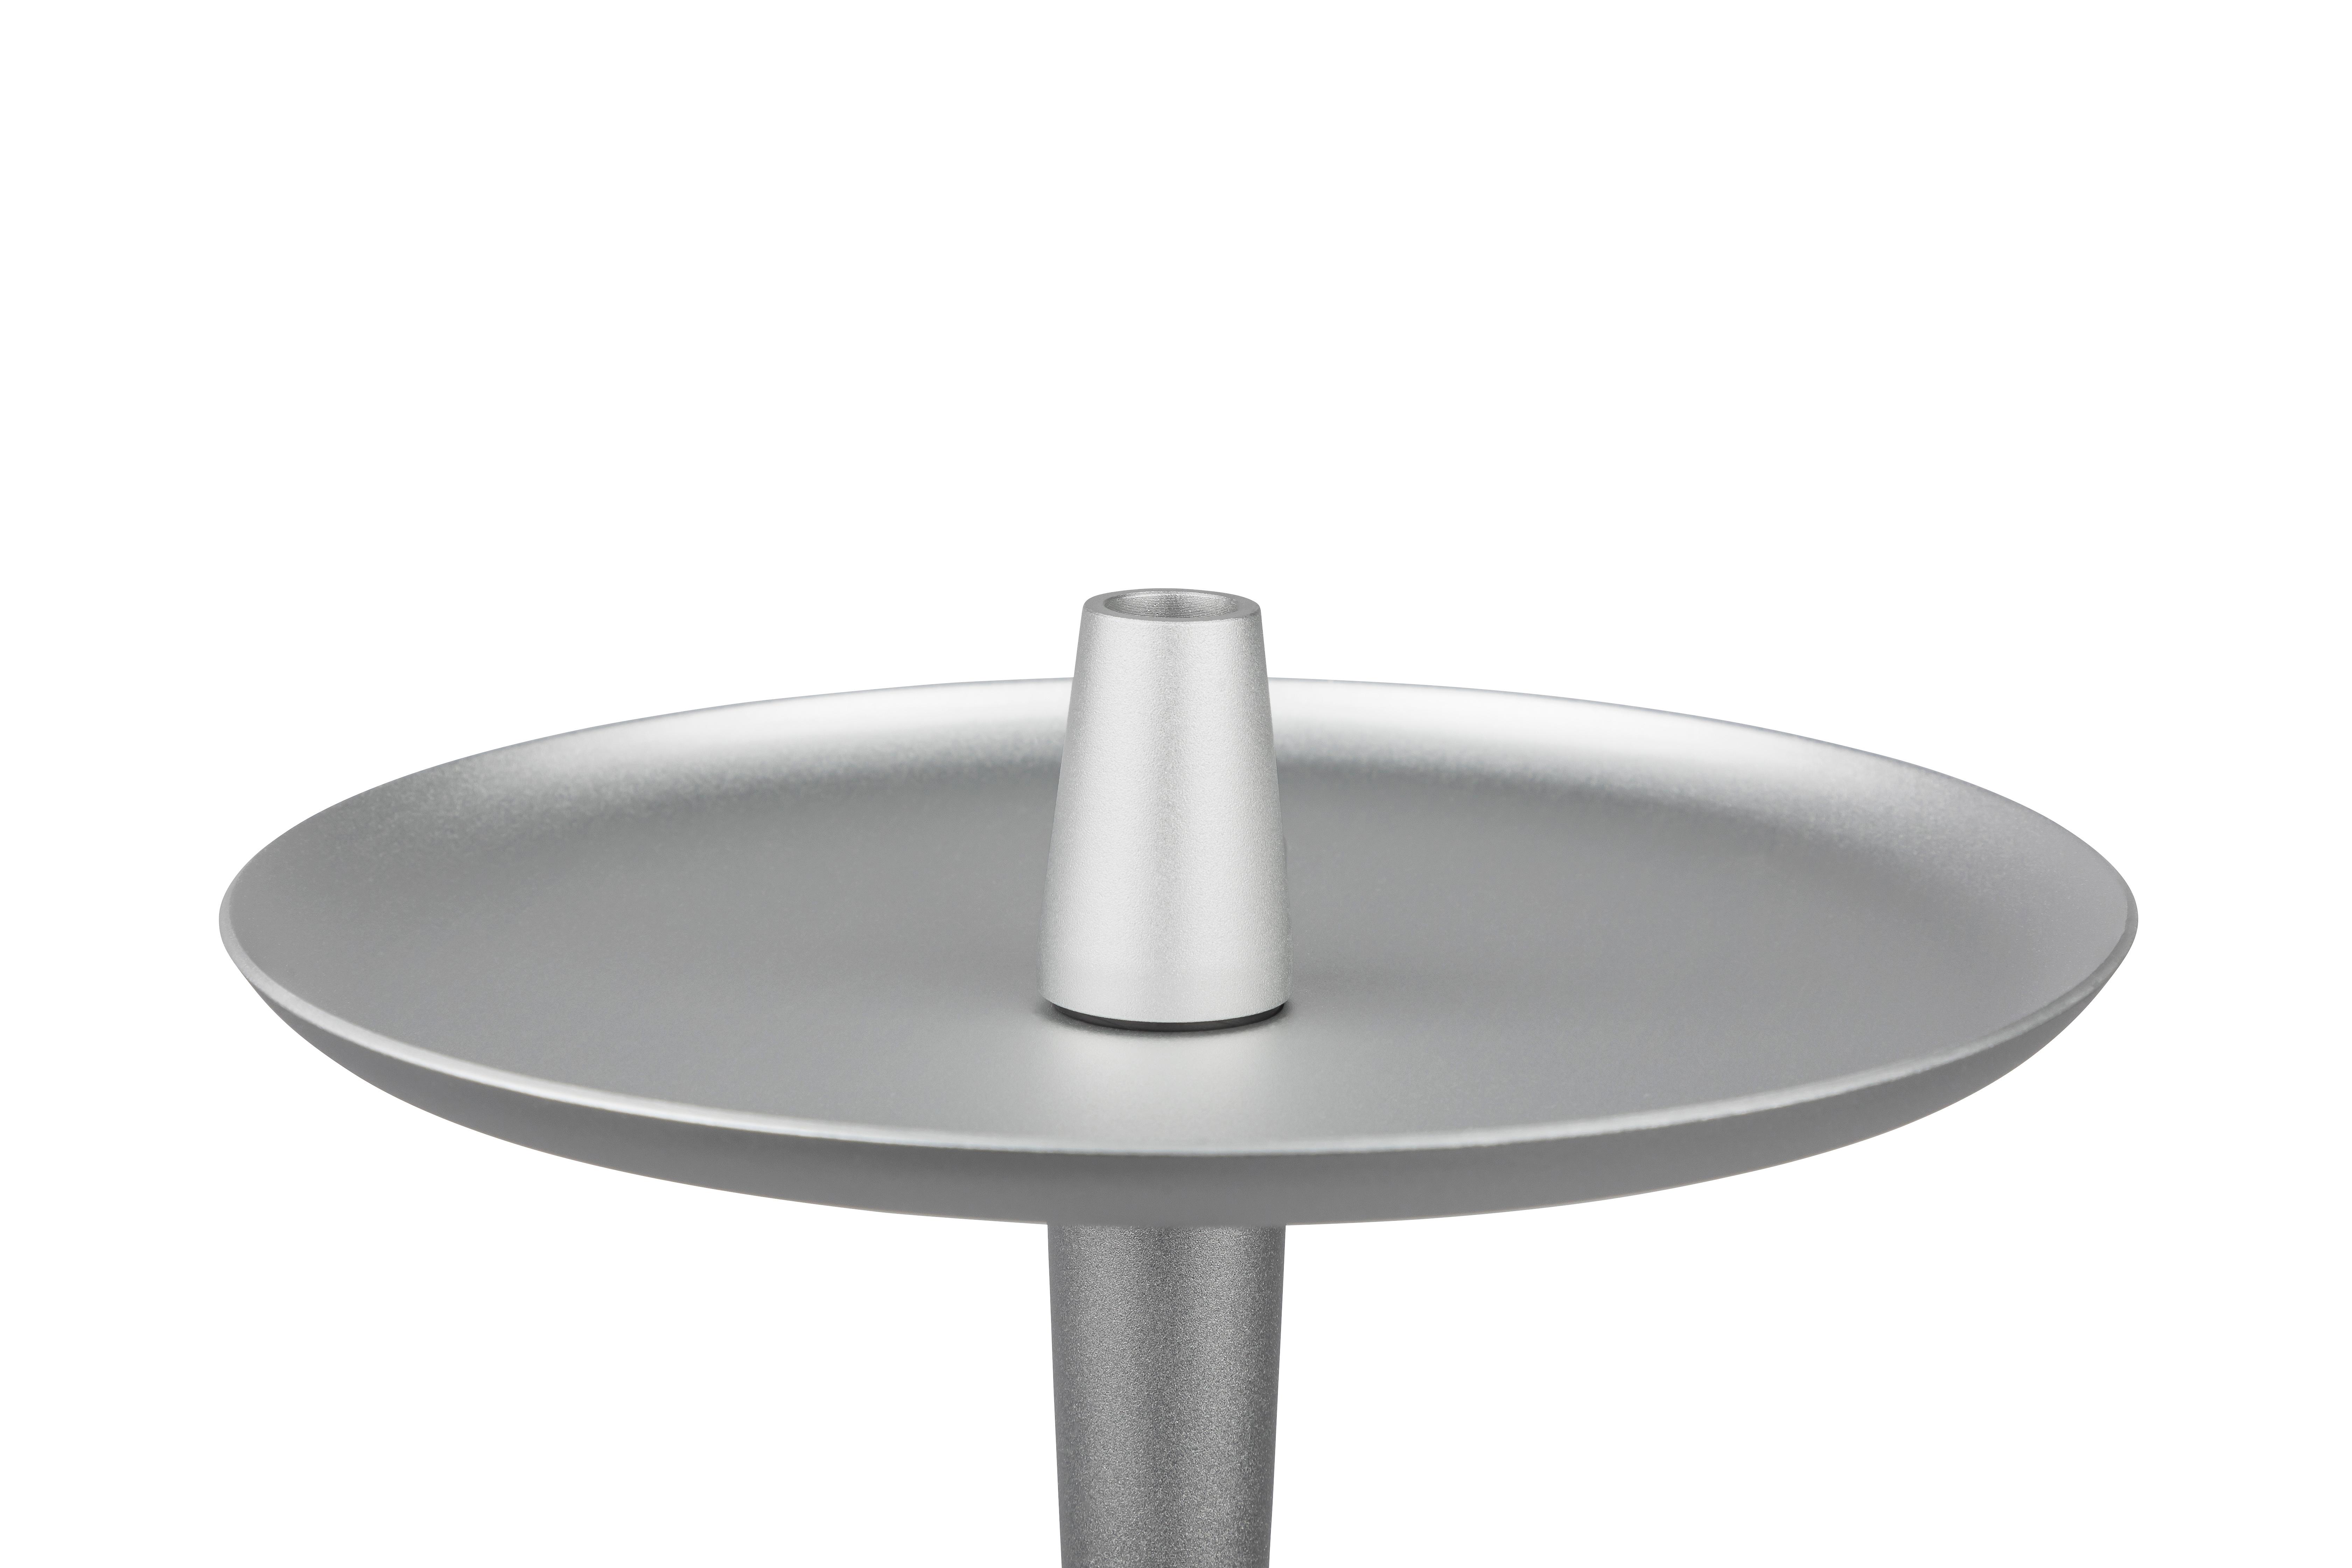 ONES S - Aluminum Silber matt / Silver matt